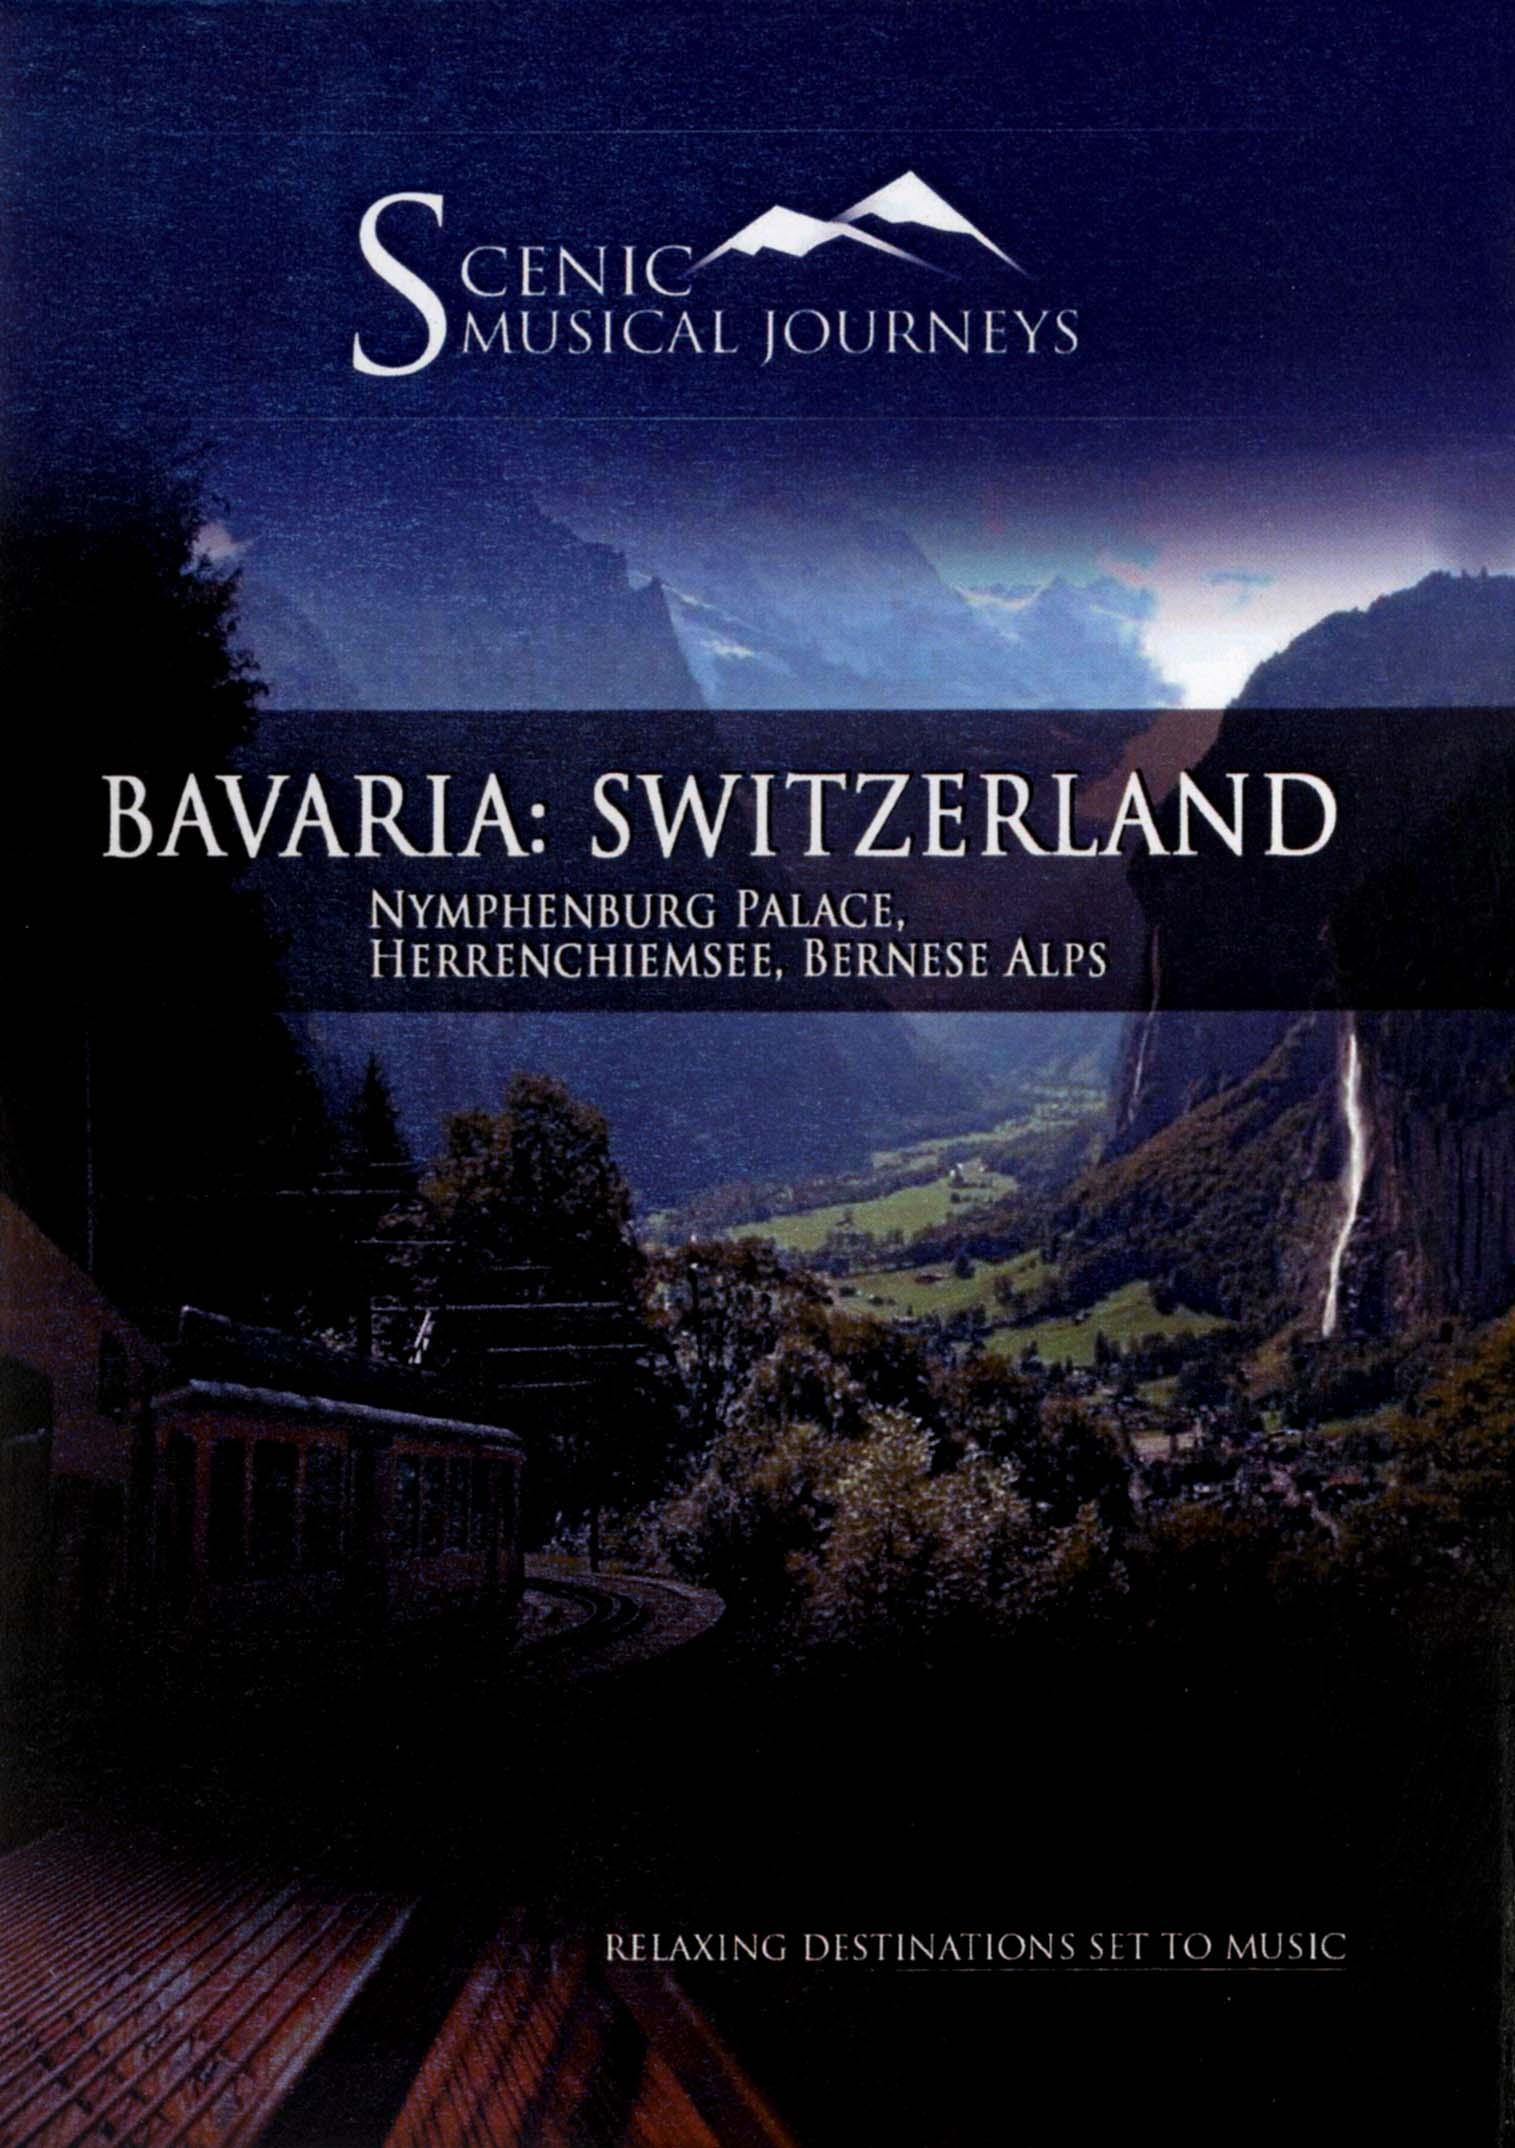 Scenic Musical Journeys: France - Bavaria: Switzerland - Nymphenburg Palace, Herrenchiemsee, Bernes